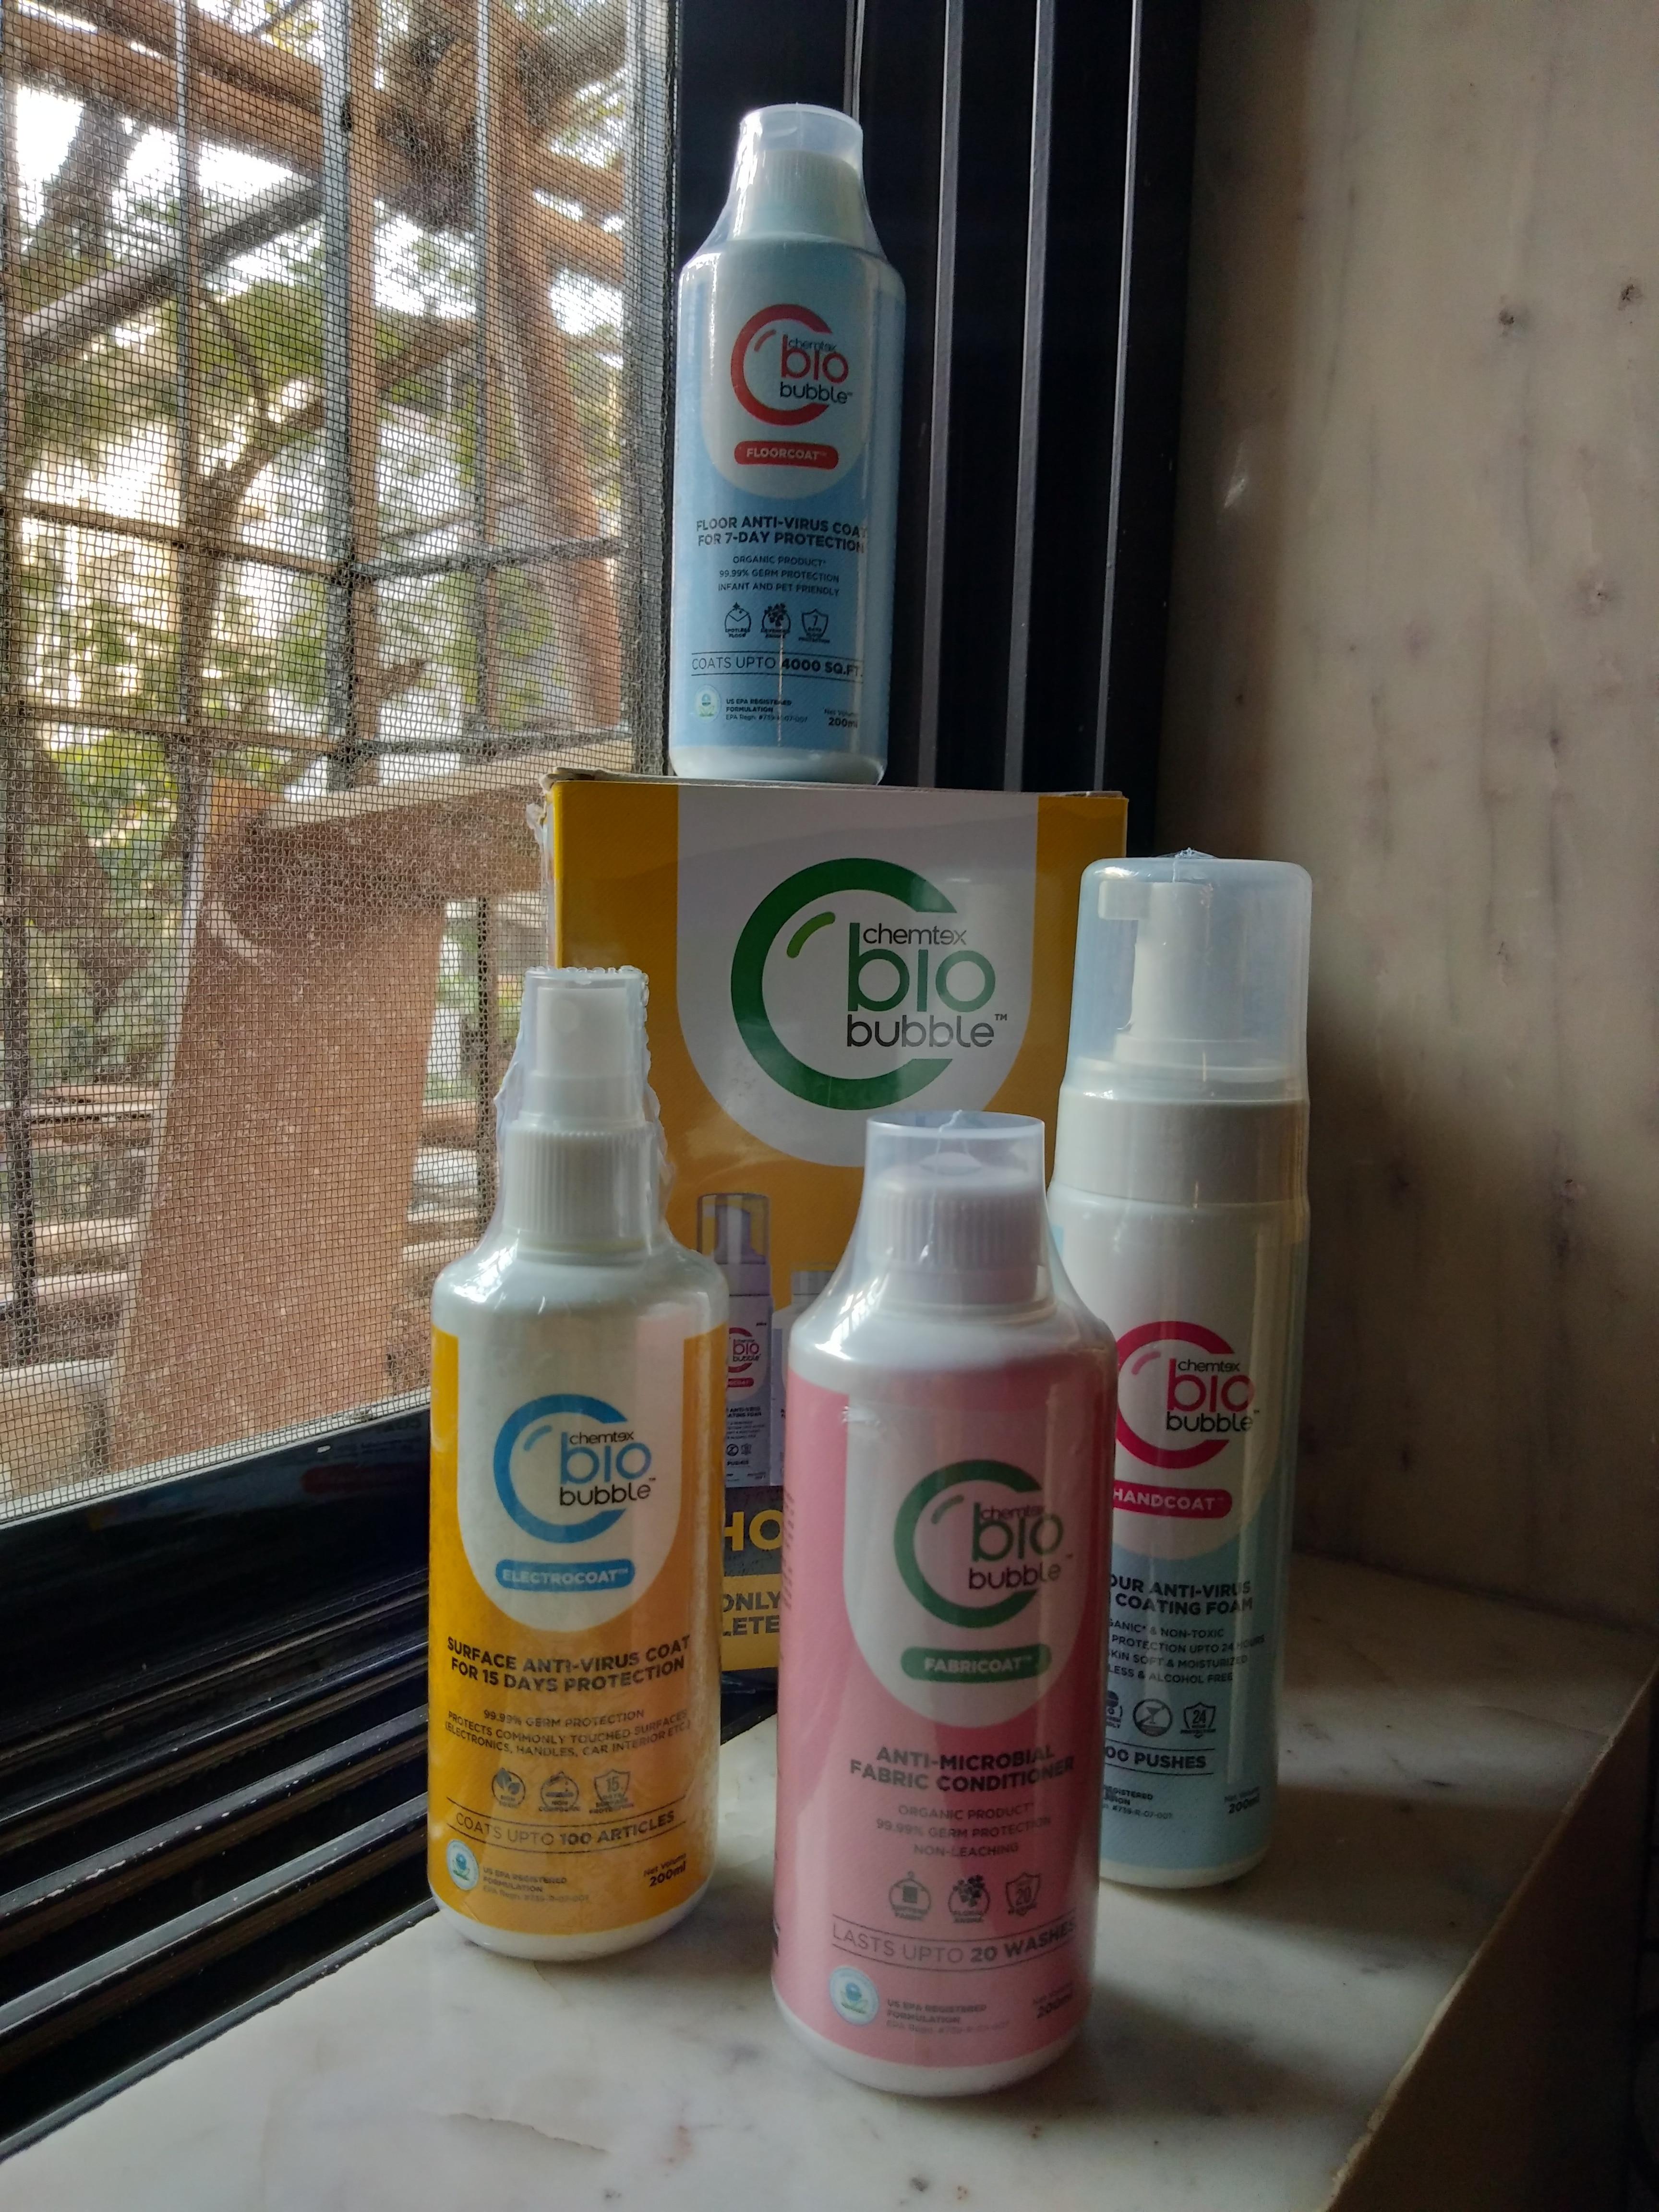 Chemtex Biobubble Home Kit-Biobubble Must At home-By samreen_memon